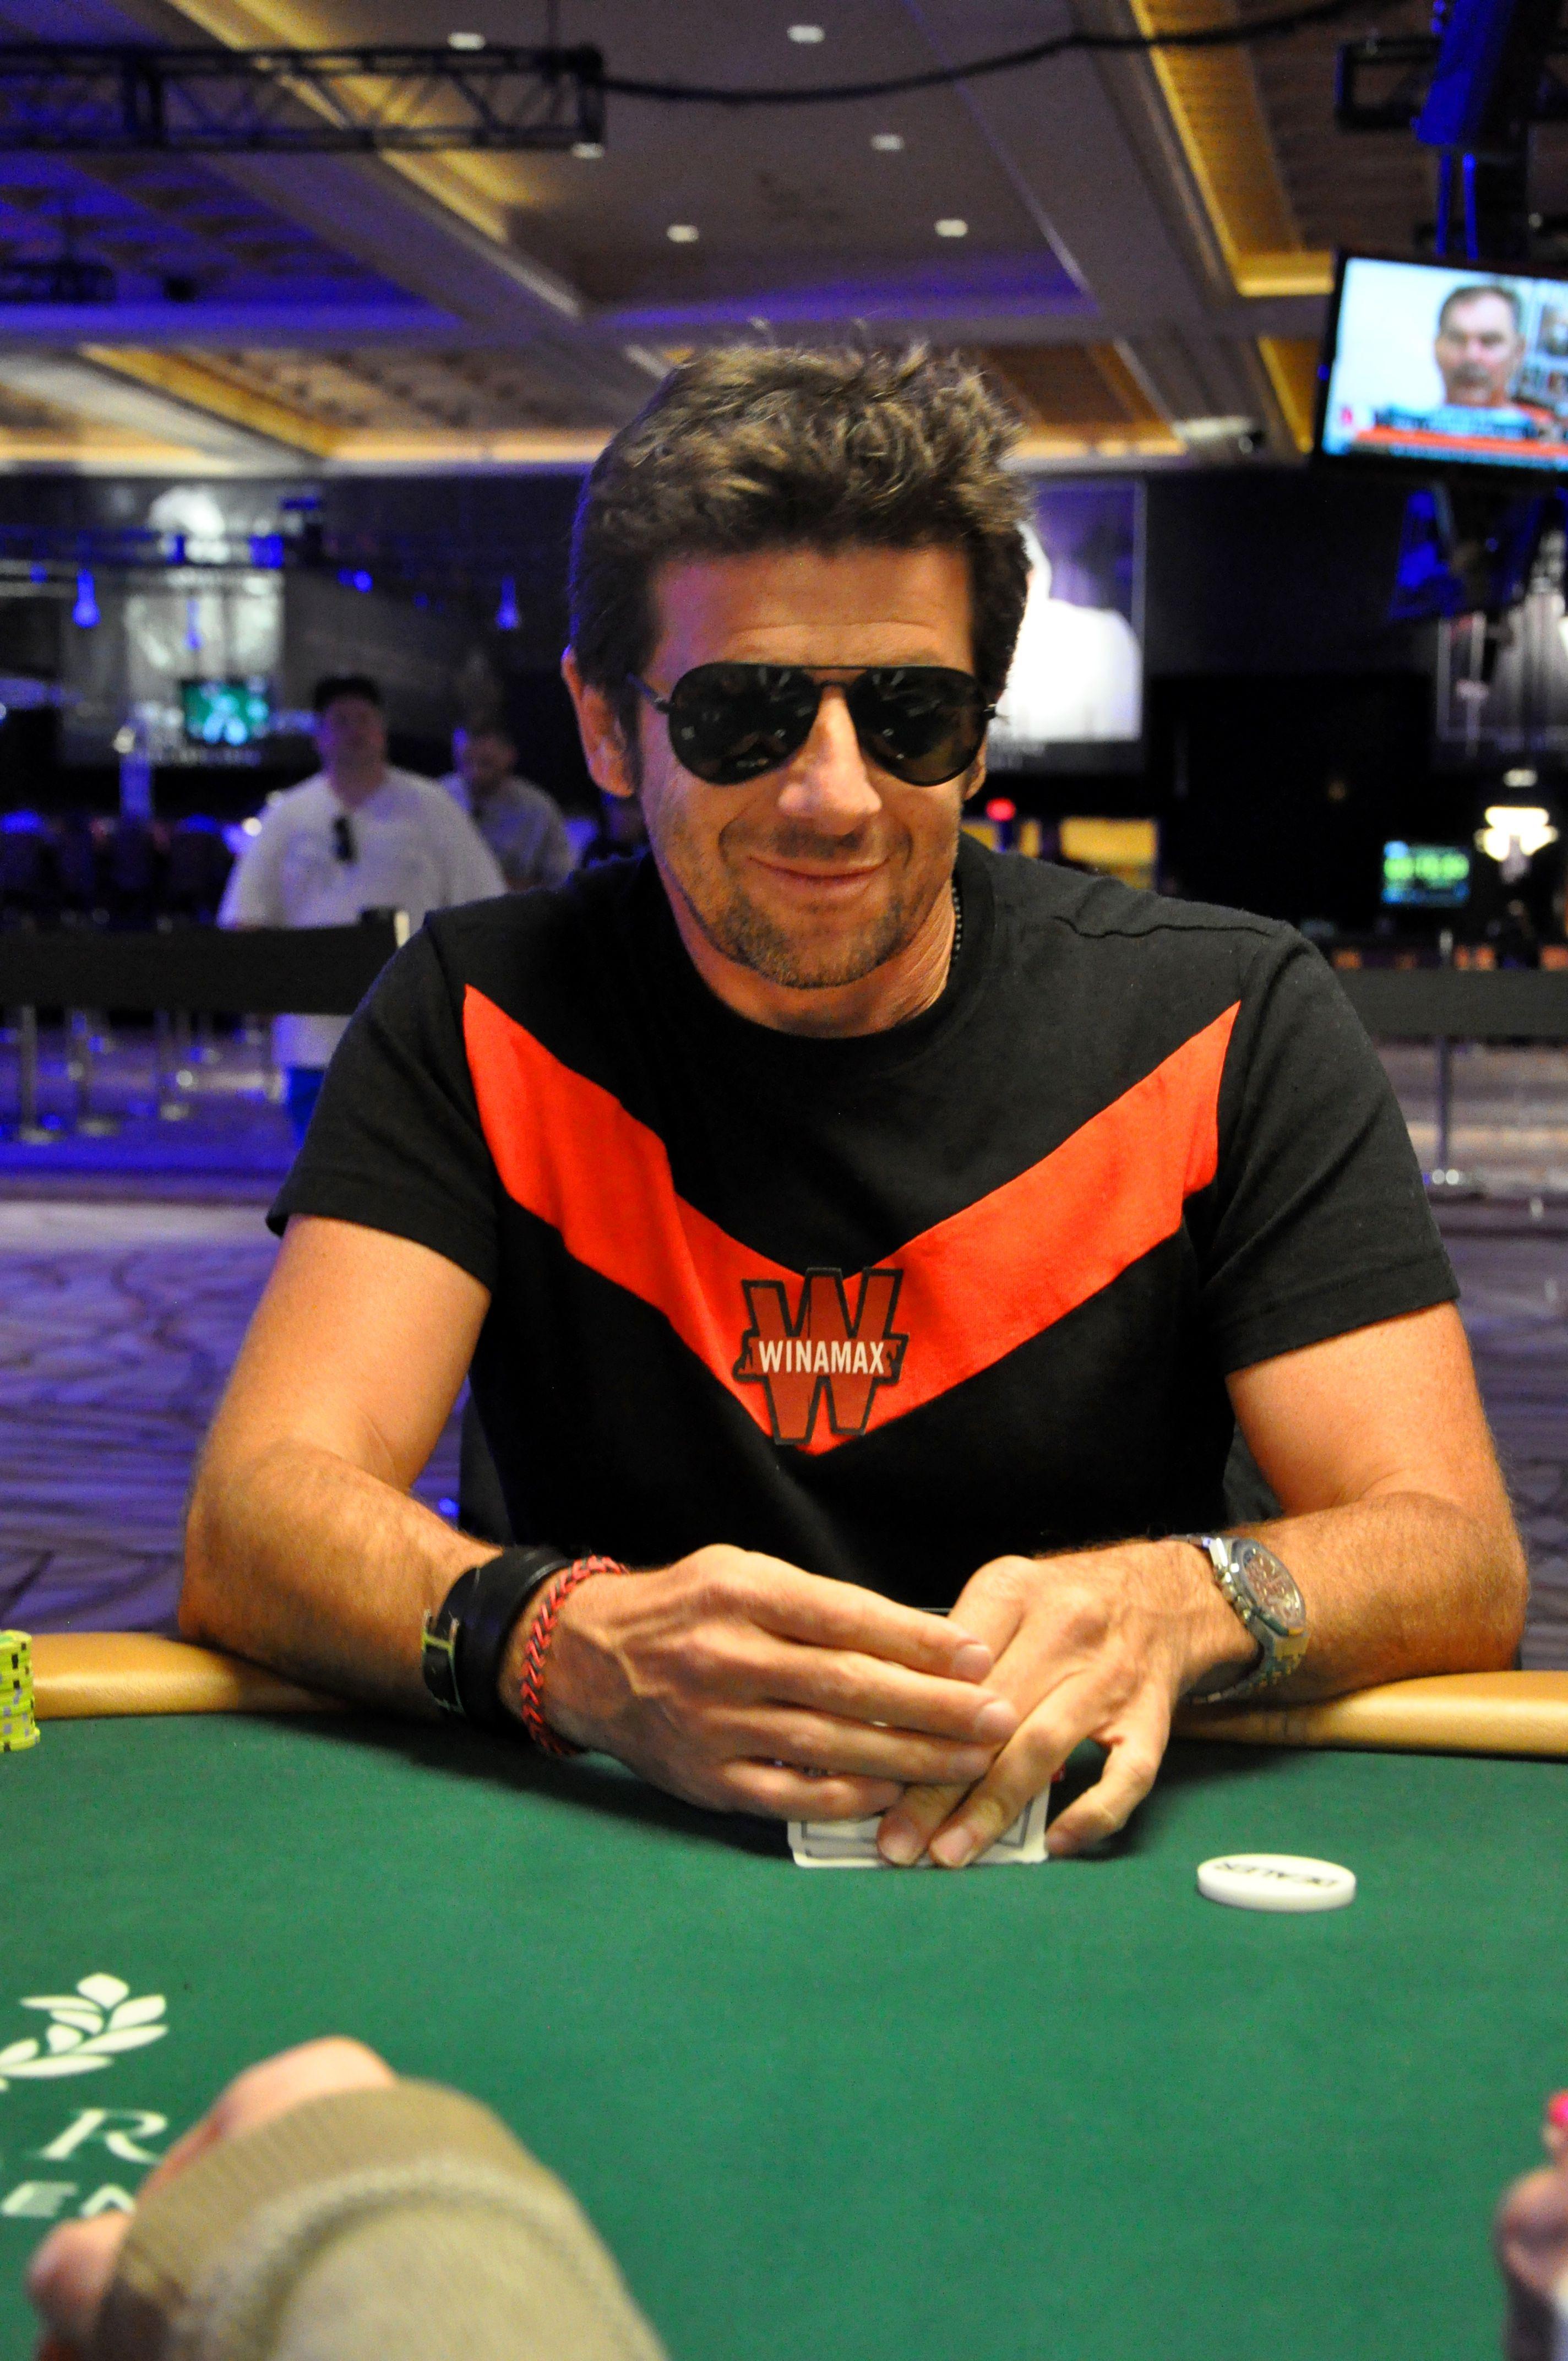 Patrick Bruel Wsop Winamax Poker Patrick Bruel Bruel Chanteurs Francais